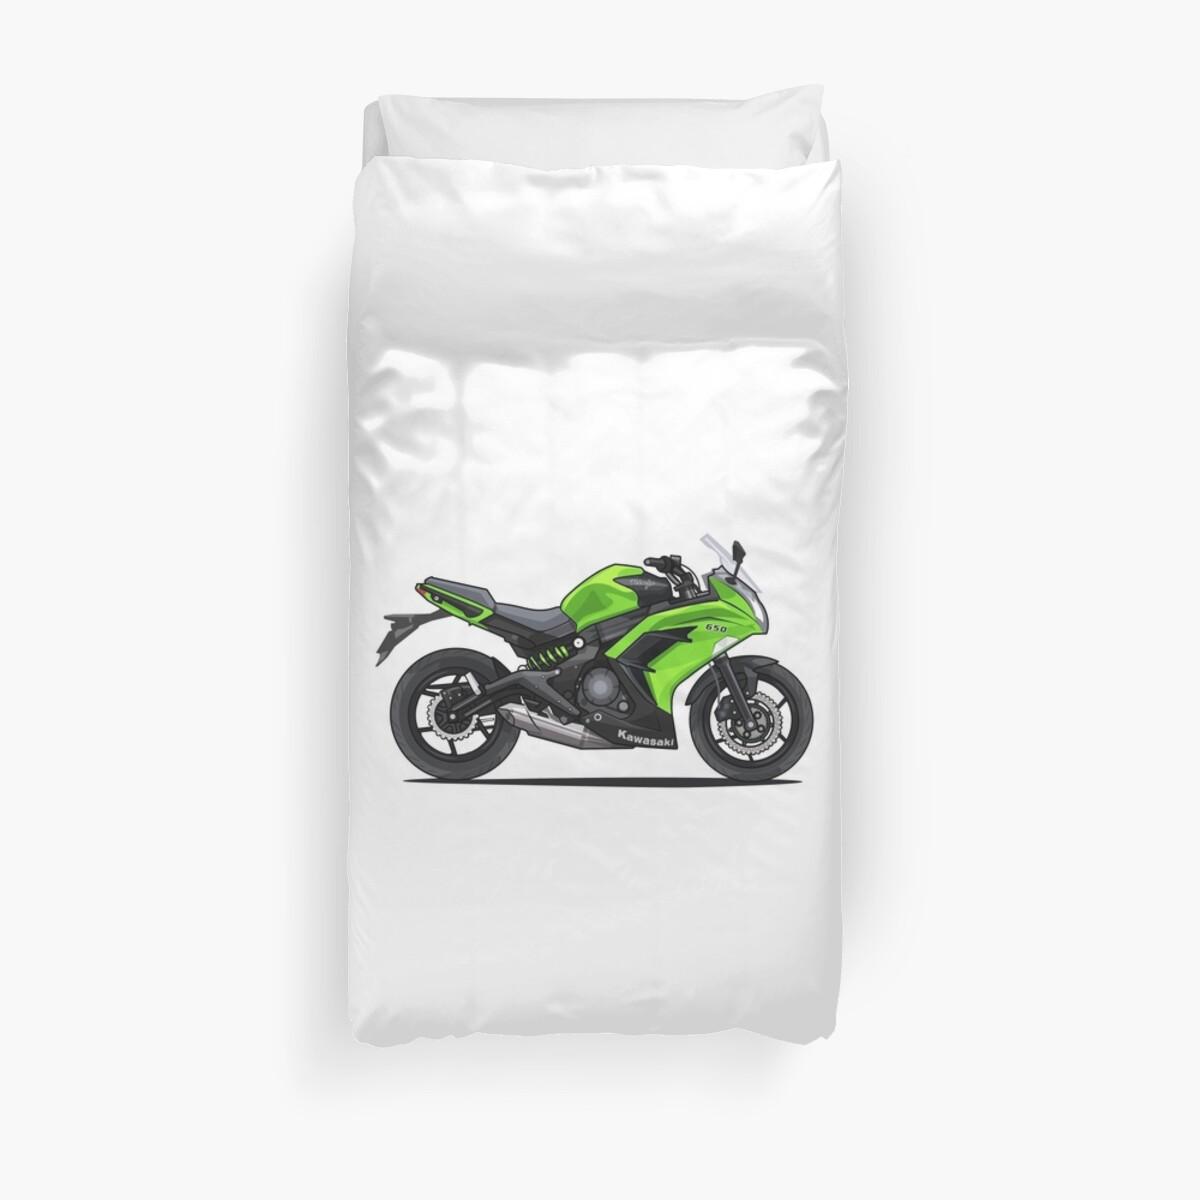 Kawasaki Ninja 650 Moto Housses De Couette Par Xever Redbubble